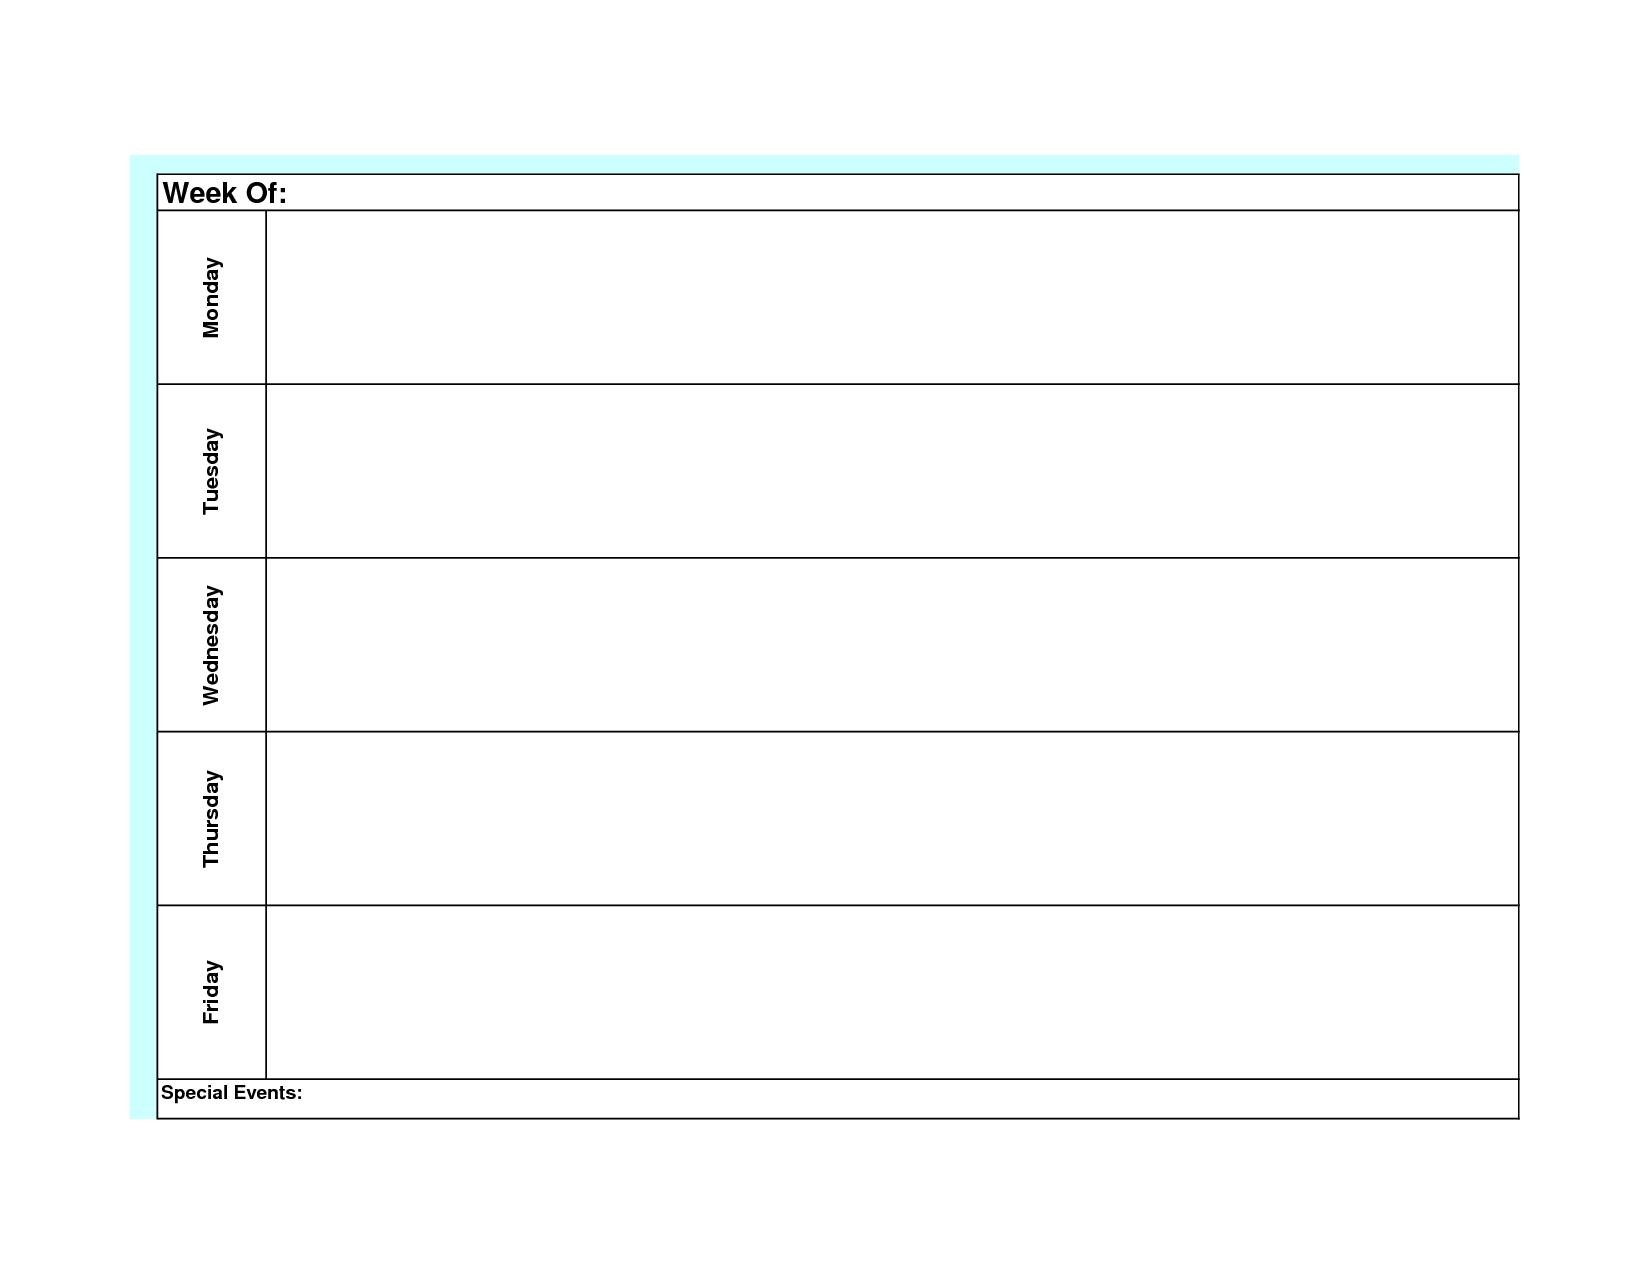 Blank Weekly Calendar Template Monday Friday   Planner   Weekly inside Printable Sunday Thru Saturday To Do List Calendar